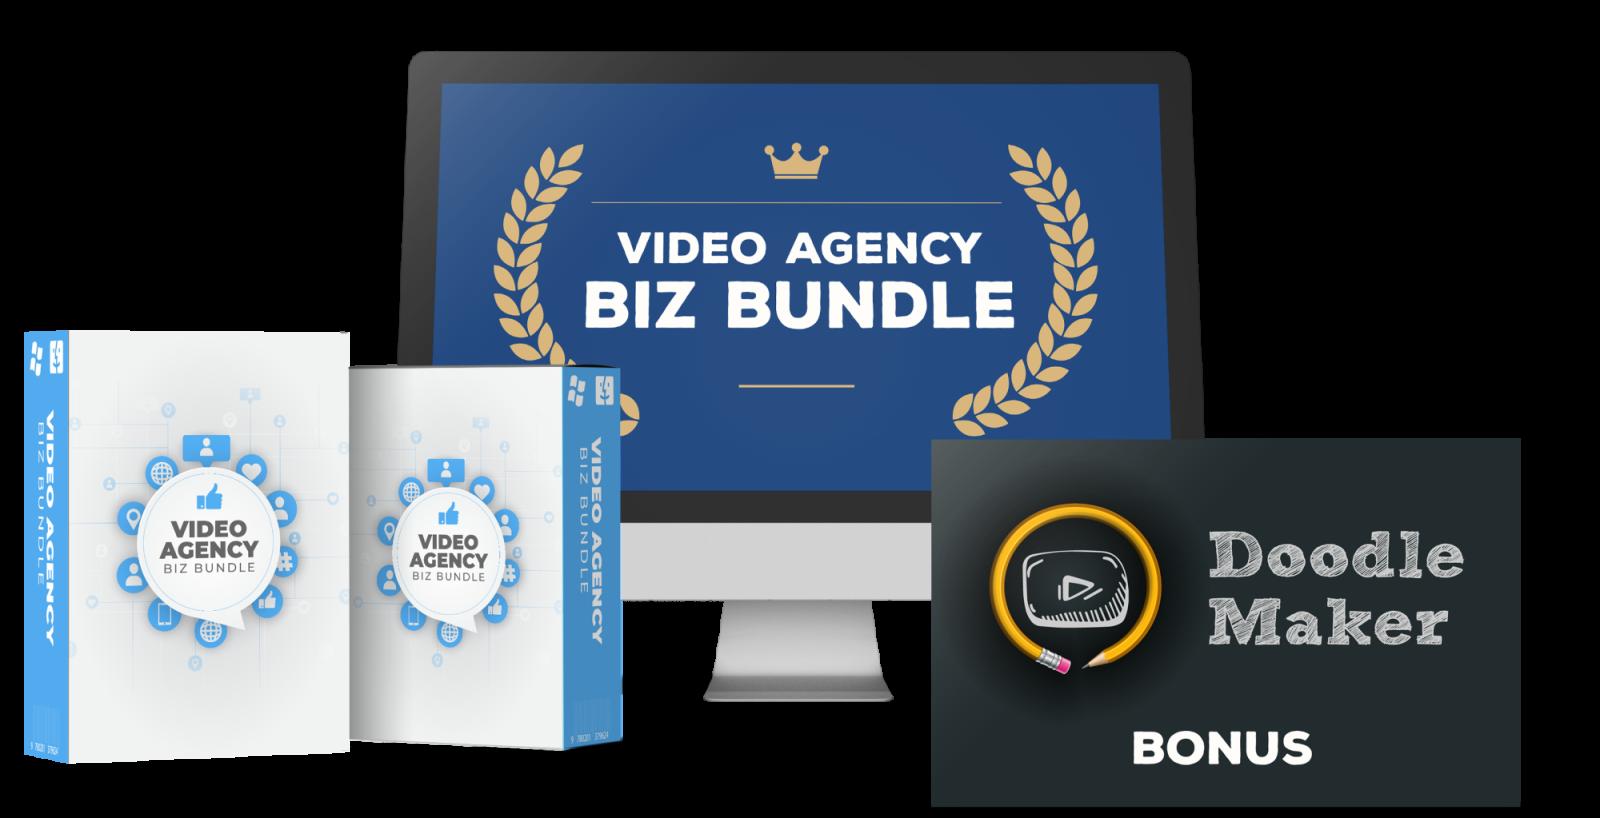 Doodle Maker Bonus 3 -Video Agency Biz Bundle